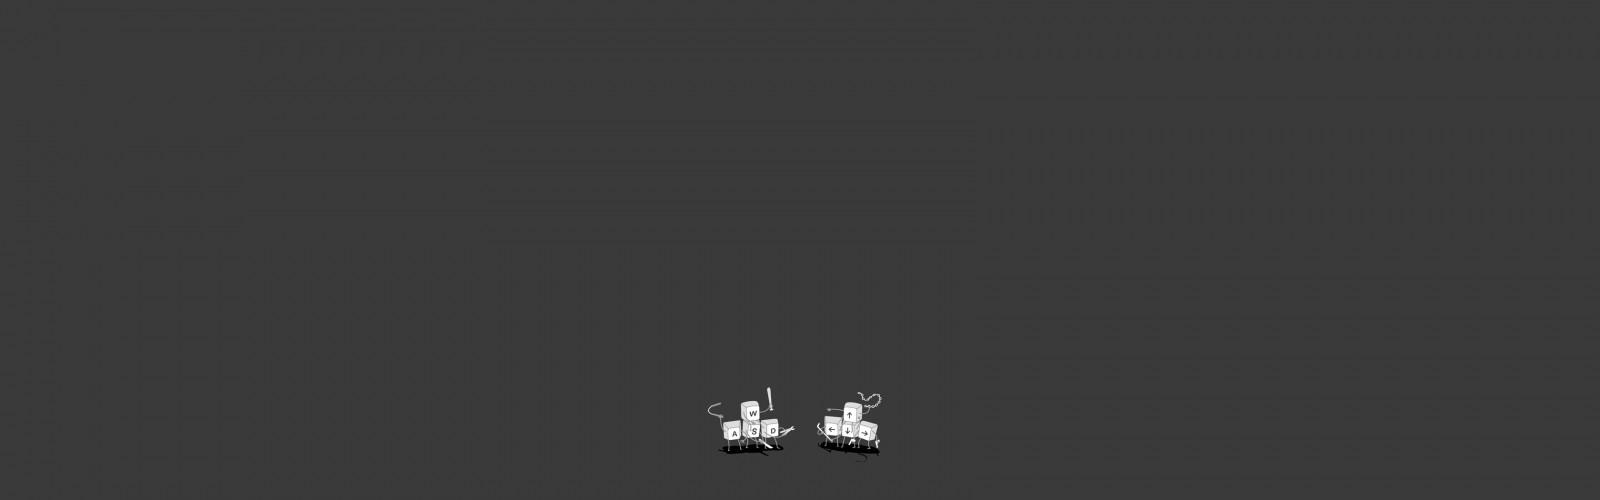 Wallpaper : black, video games, minimalism, humor, text ...